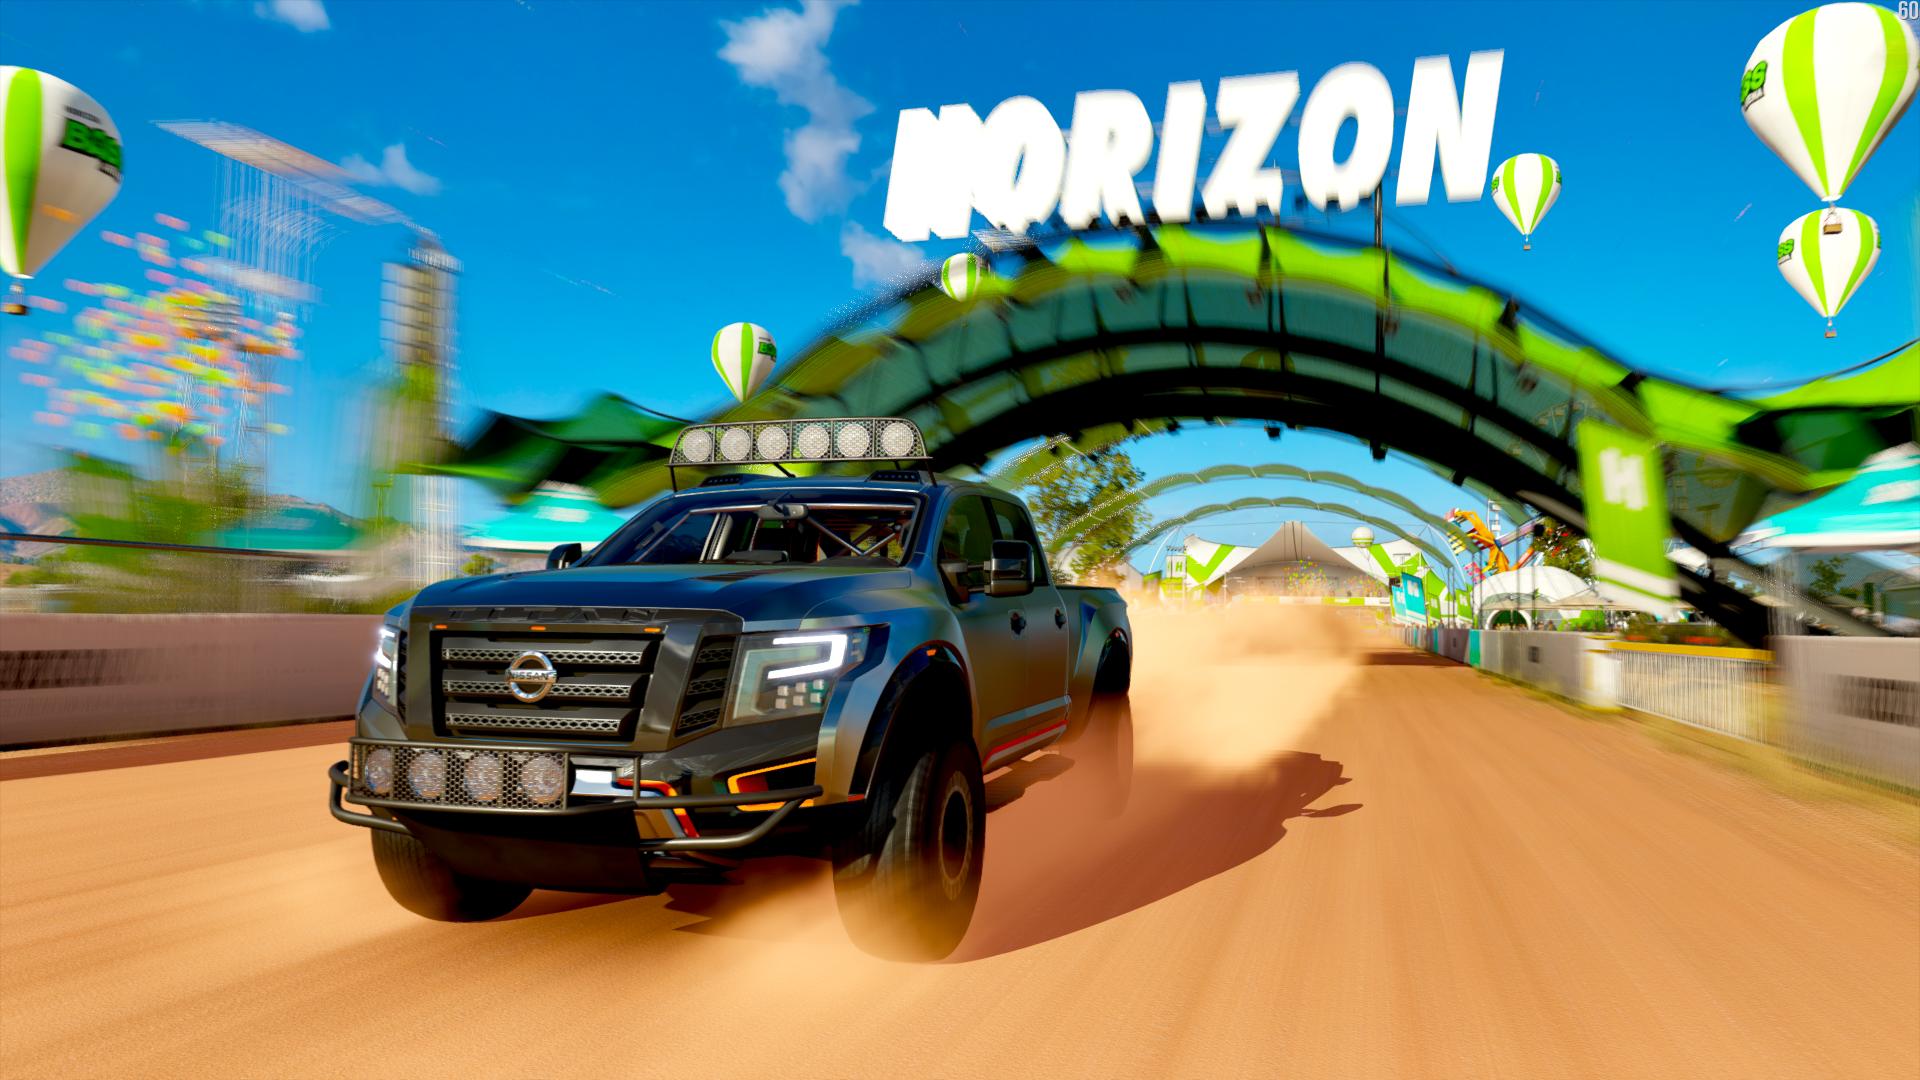 General 1920x1080 Forza racing race cars Xbox Xbox One Microsoft PC gaming Master Race screen shot Nissan forza horizon 3